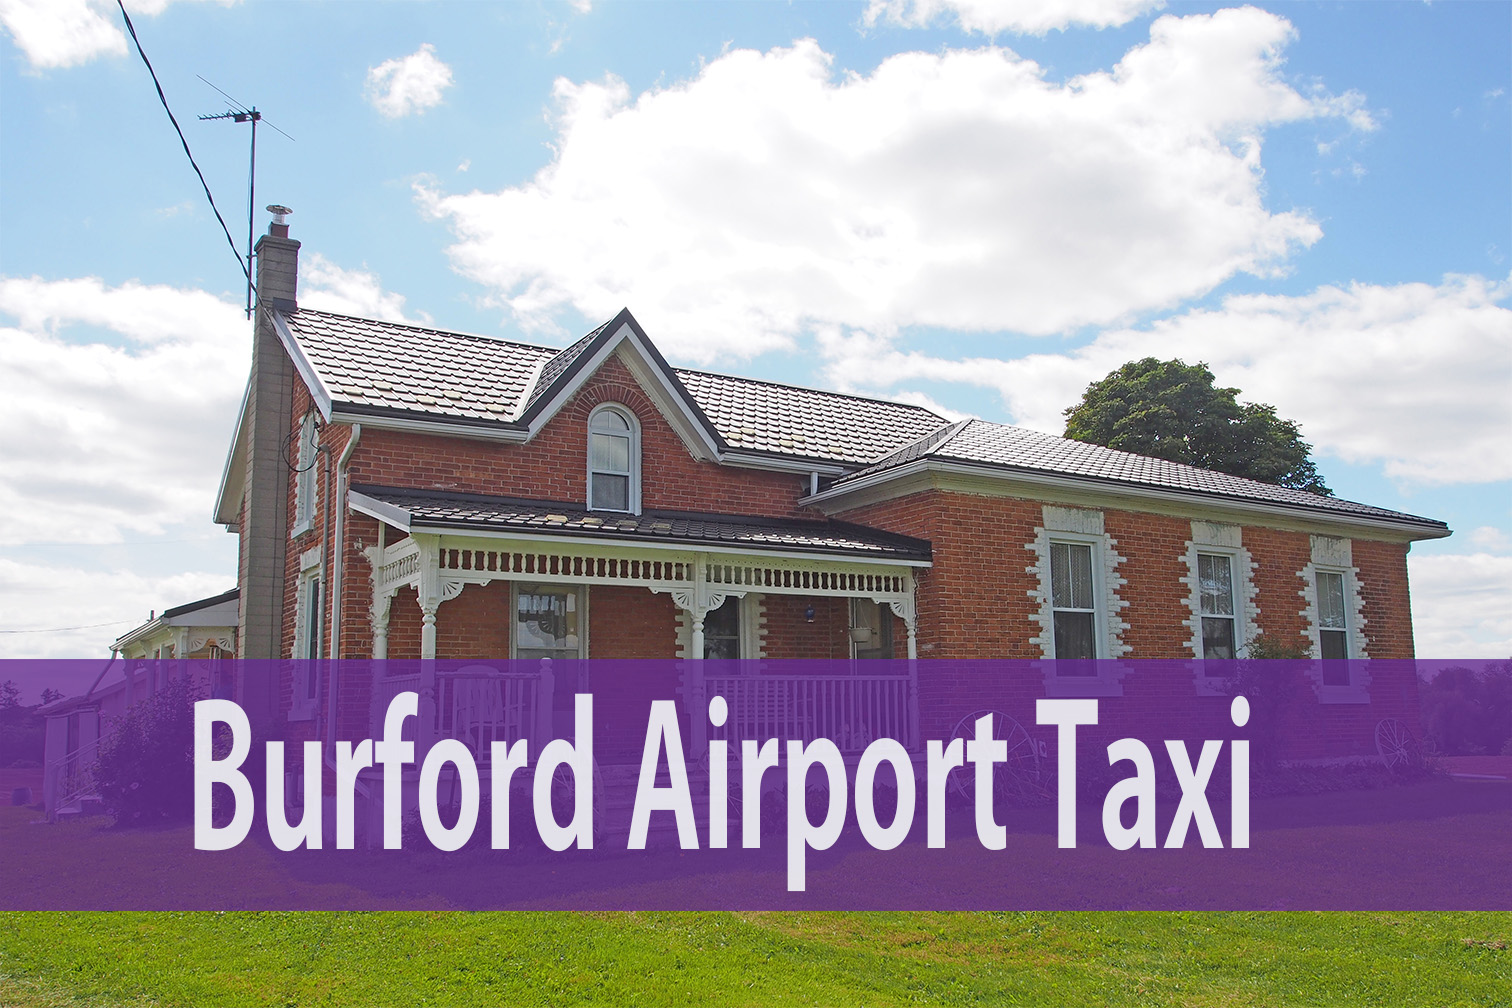 Burford Airport Taxi